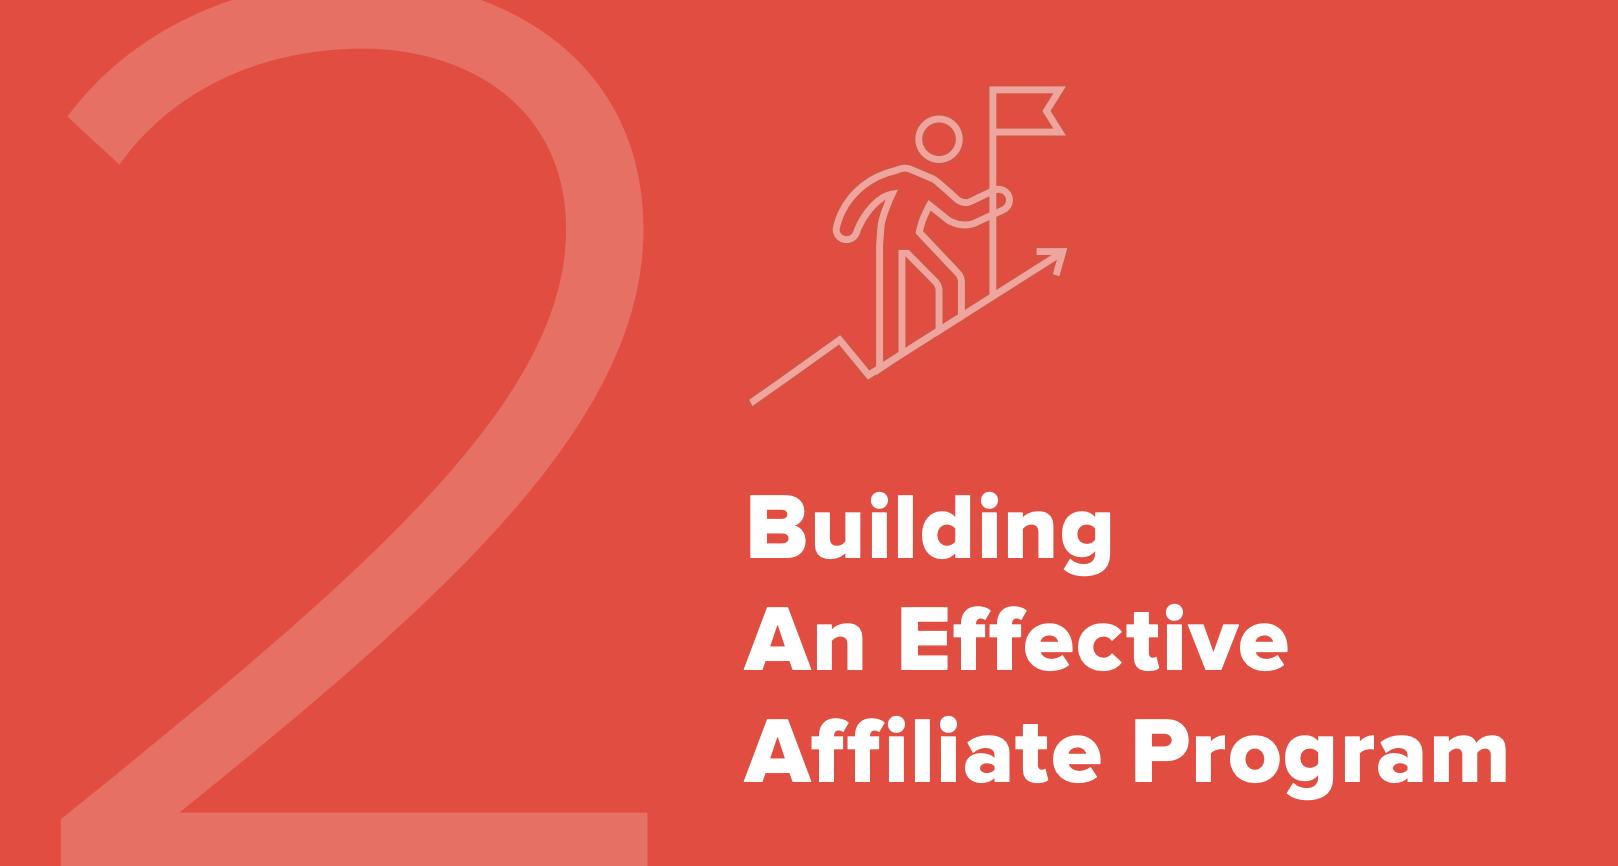 Building an effective affiliate program